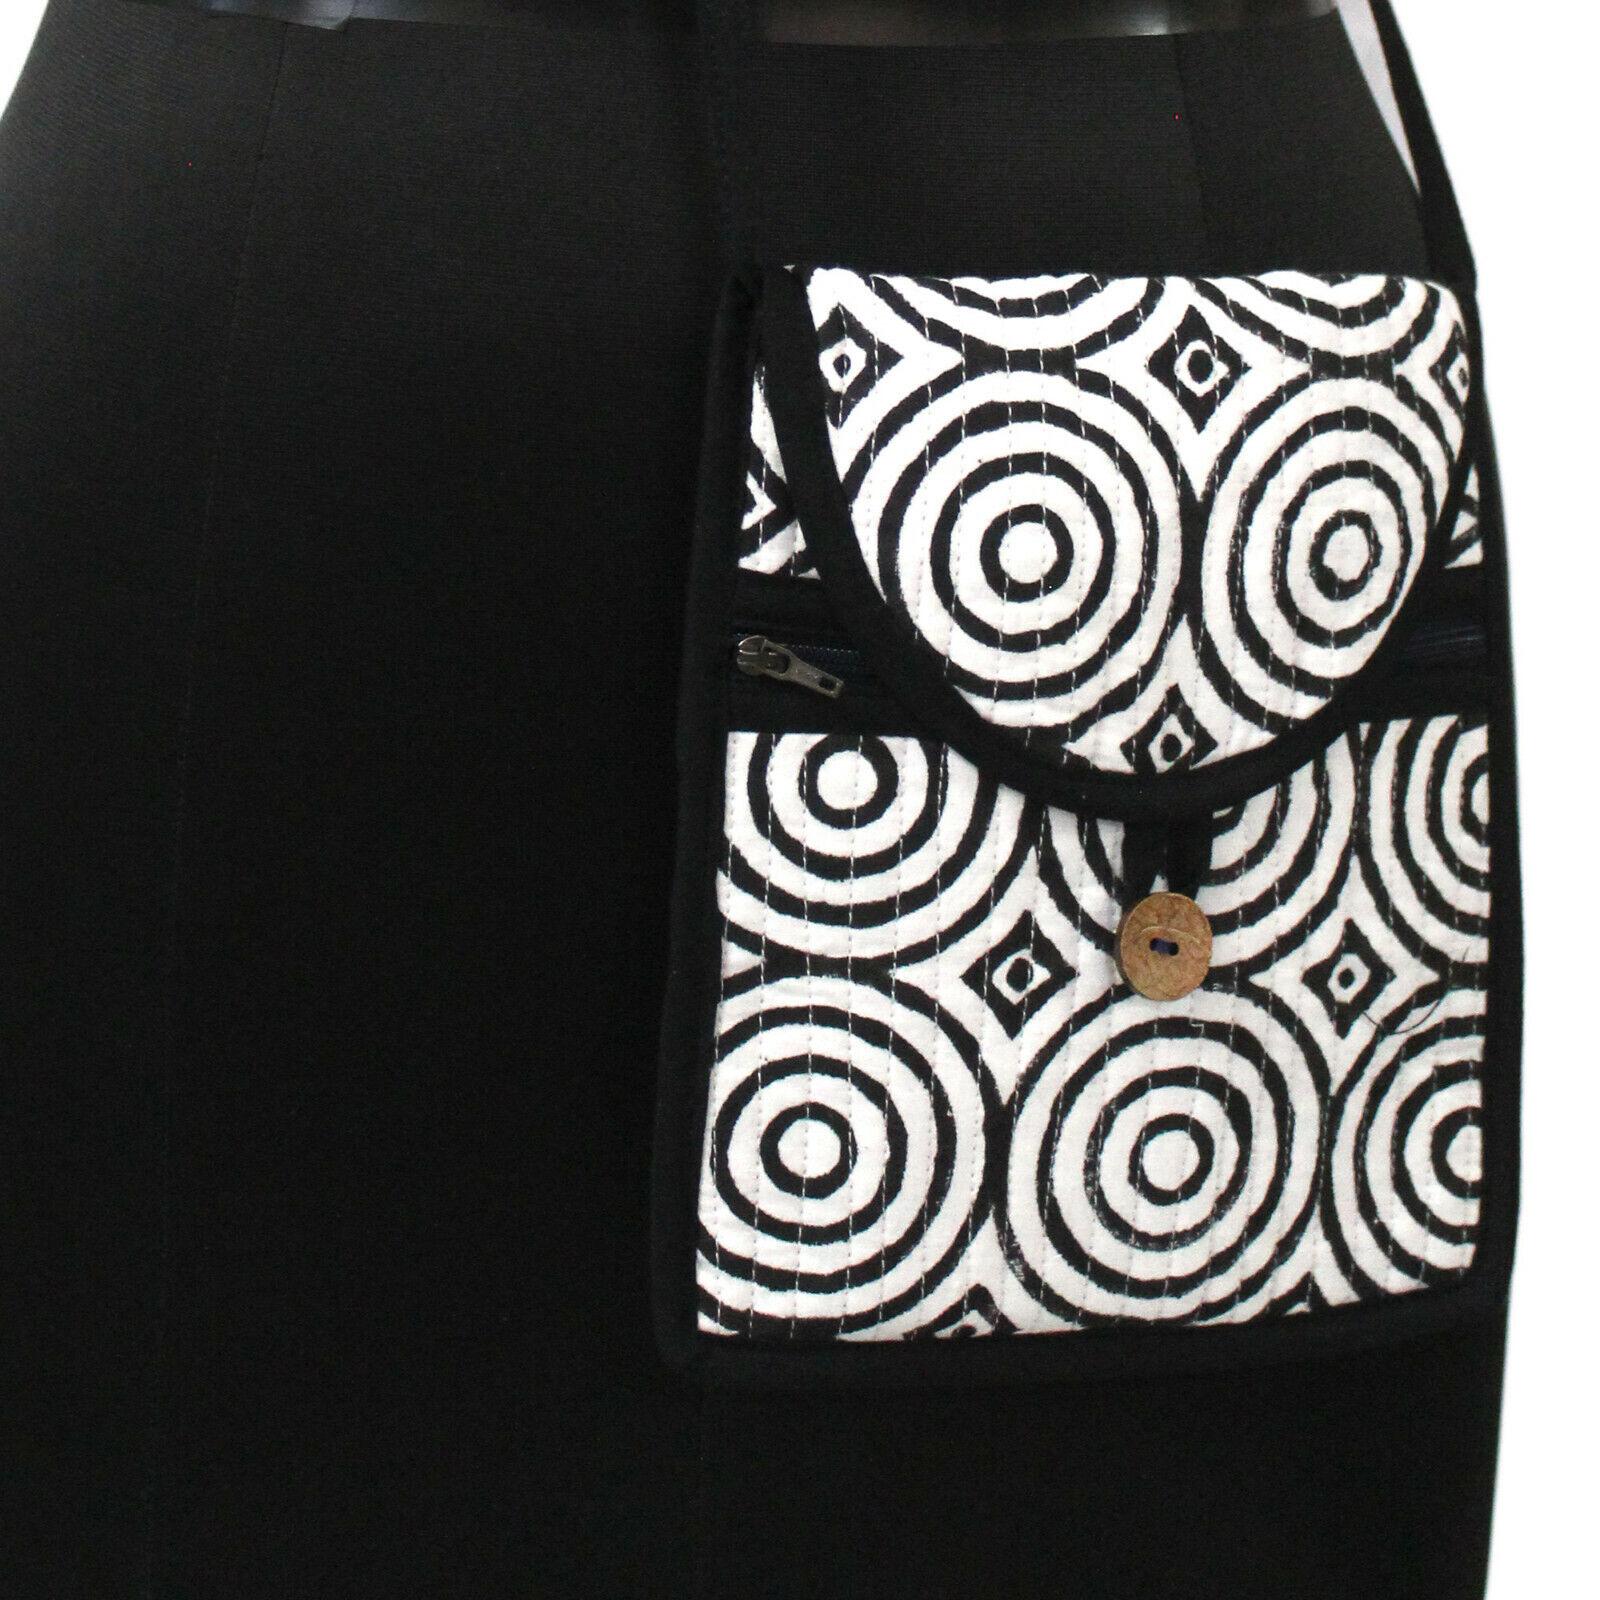 New 100% Cotton Girls Side Bag Cross Body Bag Circle Hand-Block Printed Side Bag